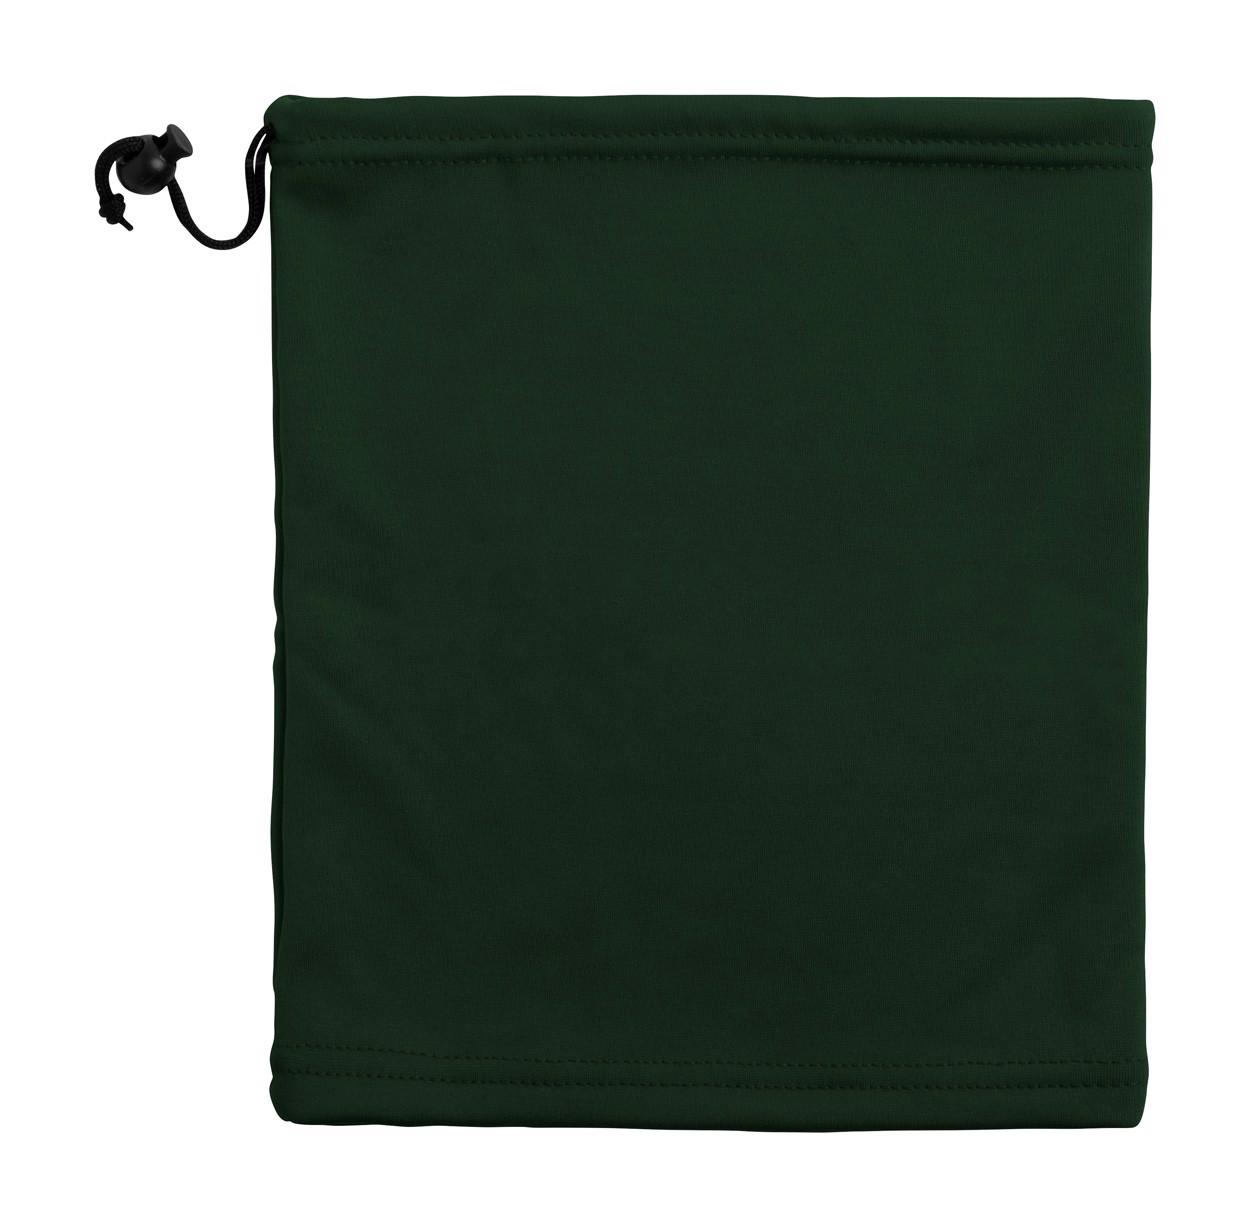 Nek Warmer Și Căciulă Ponkar - Verde Închis